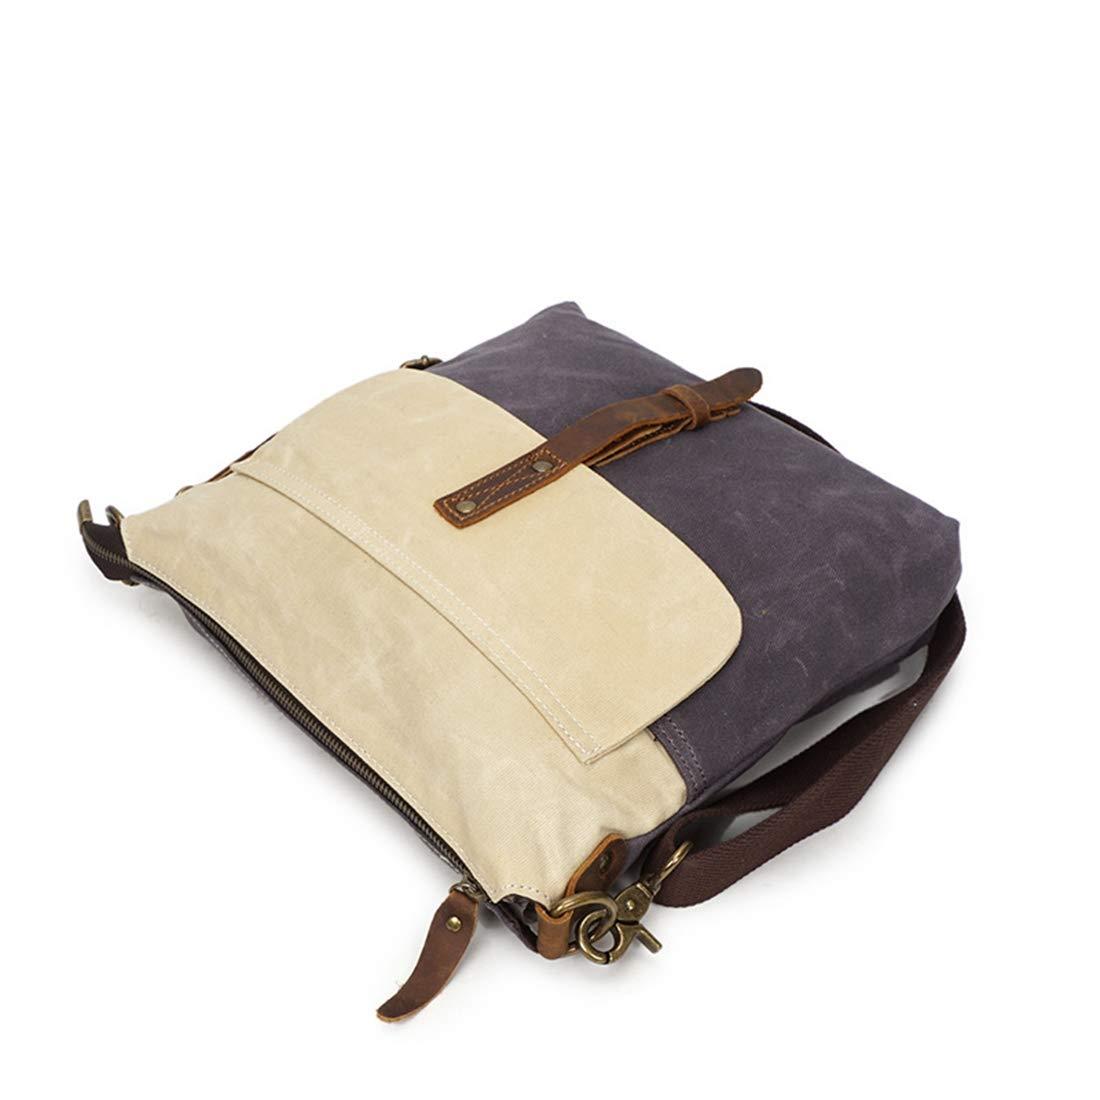 KRPENRIO Simple Retro Zipper Waterproof Canvas Shoulder Bag Messenger Bag Color:Gray Color : White//Grey